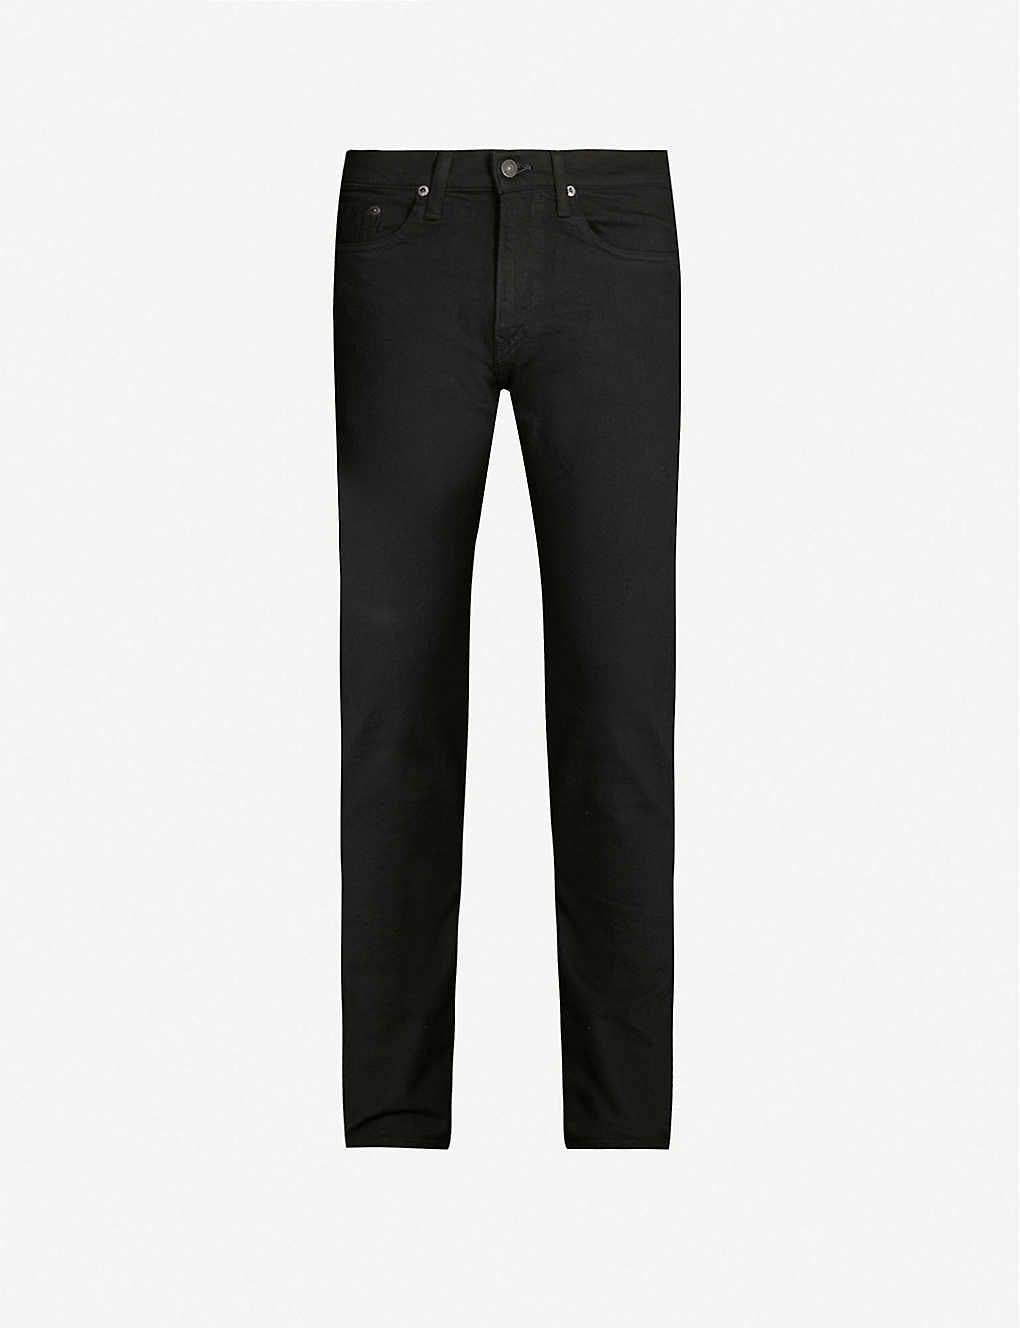 Eldridge slimfit jeans slim fit jeans polo ralph